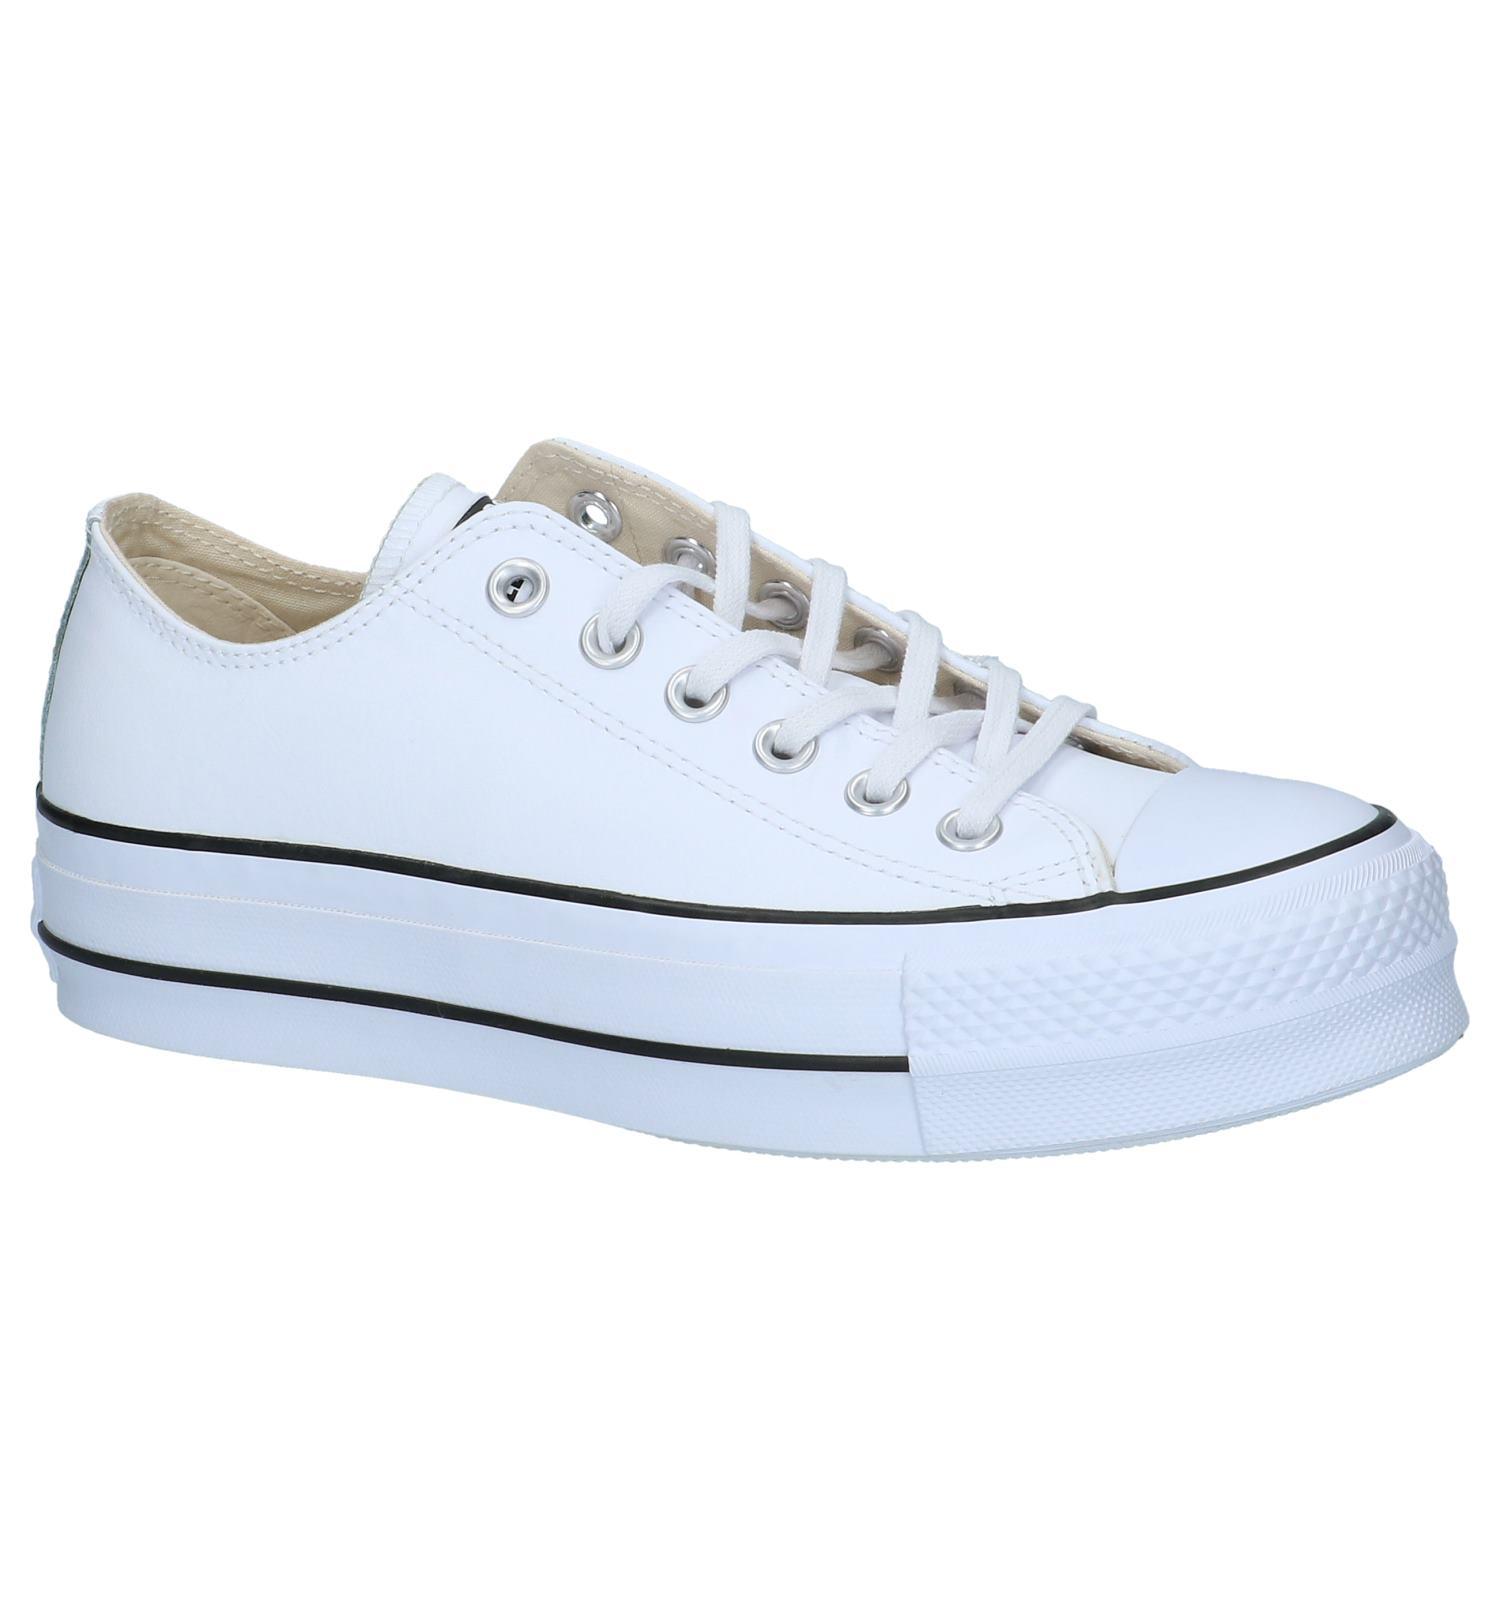 5c0ebb0adc9 Witte Lage Geklede Sneakers Converse Chuck Taylor All Stars | TORFS.BE |  Gratis verzend en retour